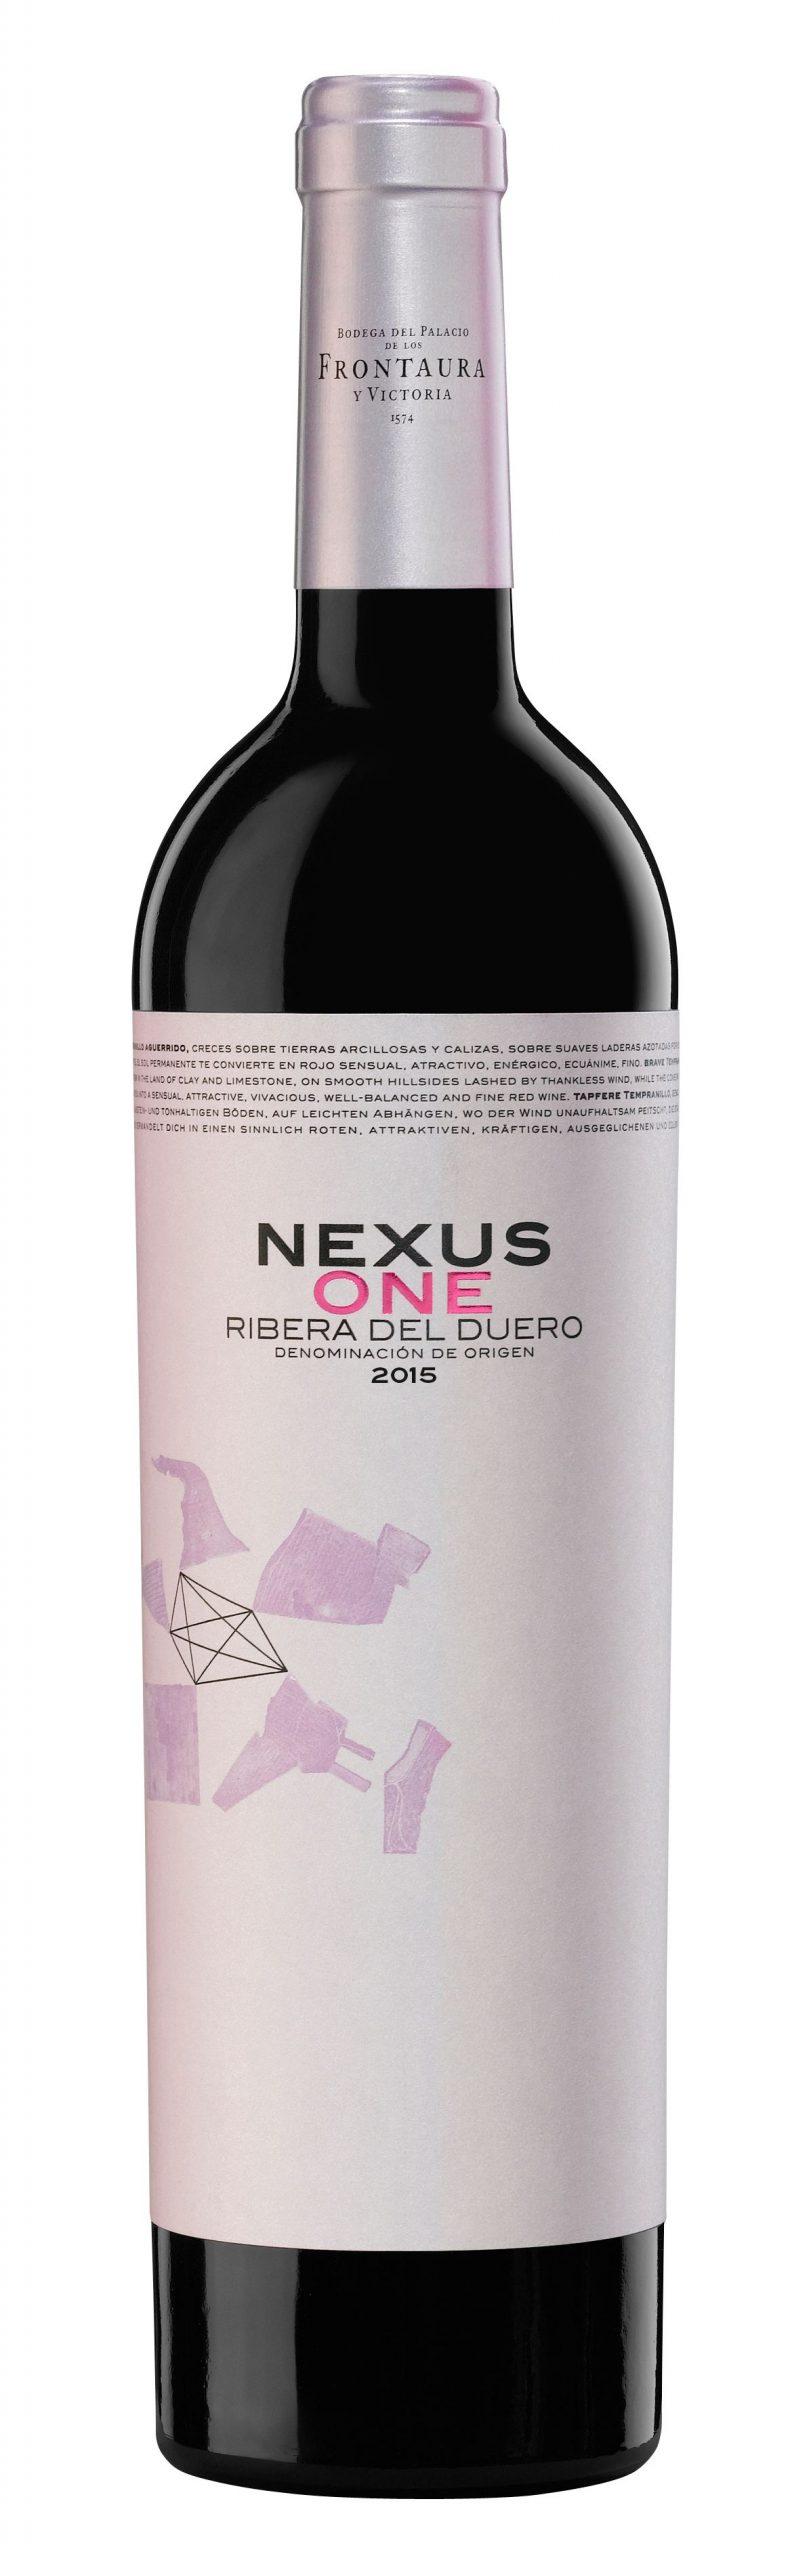 Frontaura Nexus One